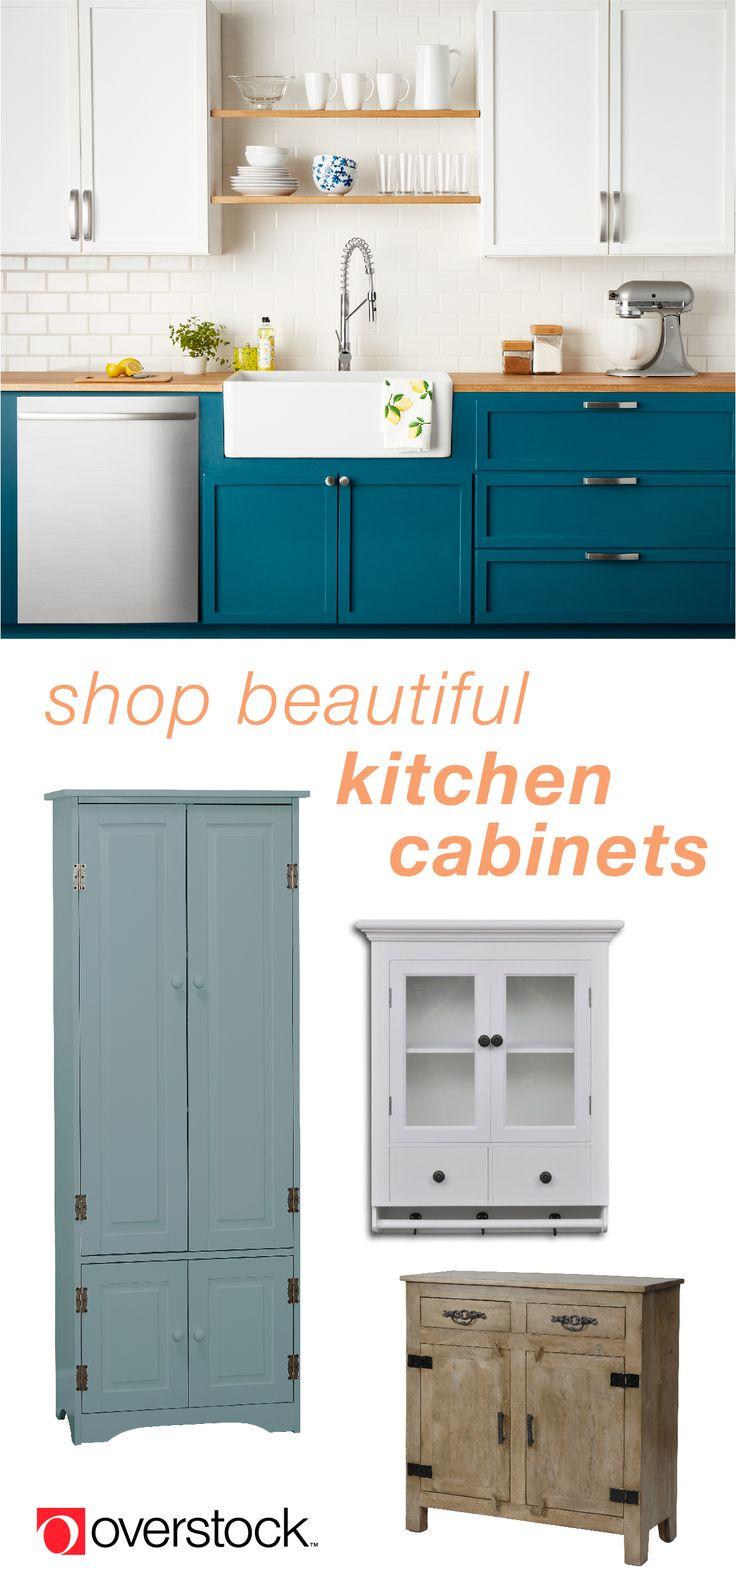 415 best Kitchen images on Pinterest | Kitchens, Updated kitchen and ...